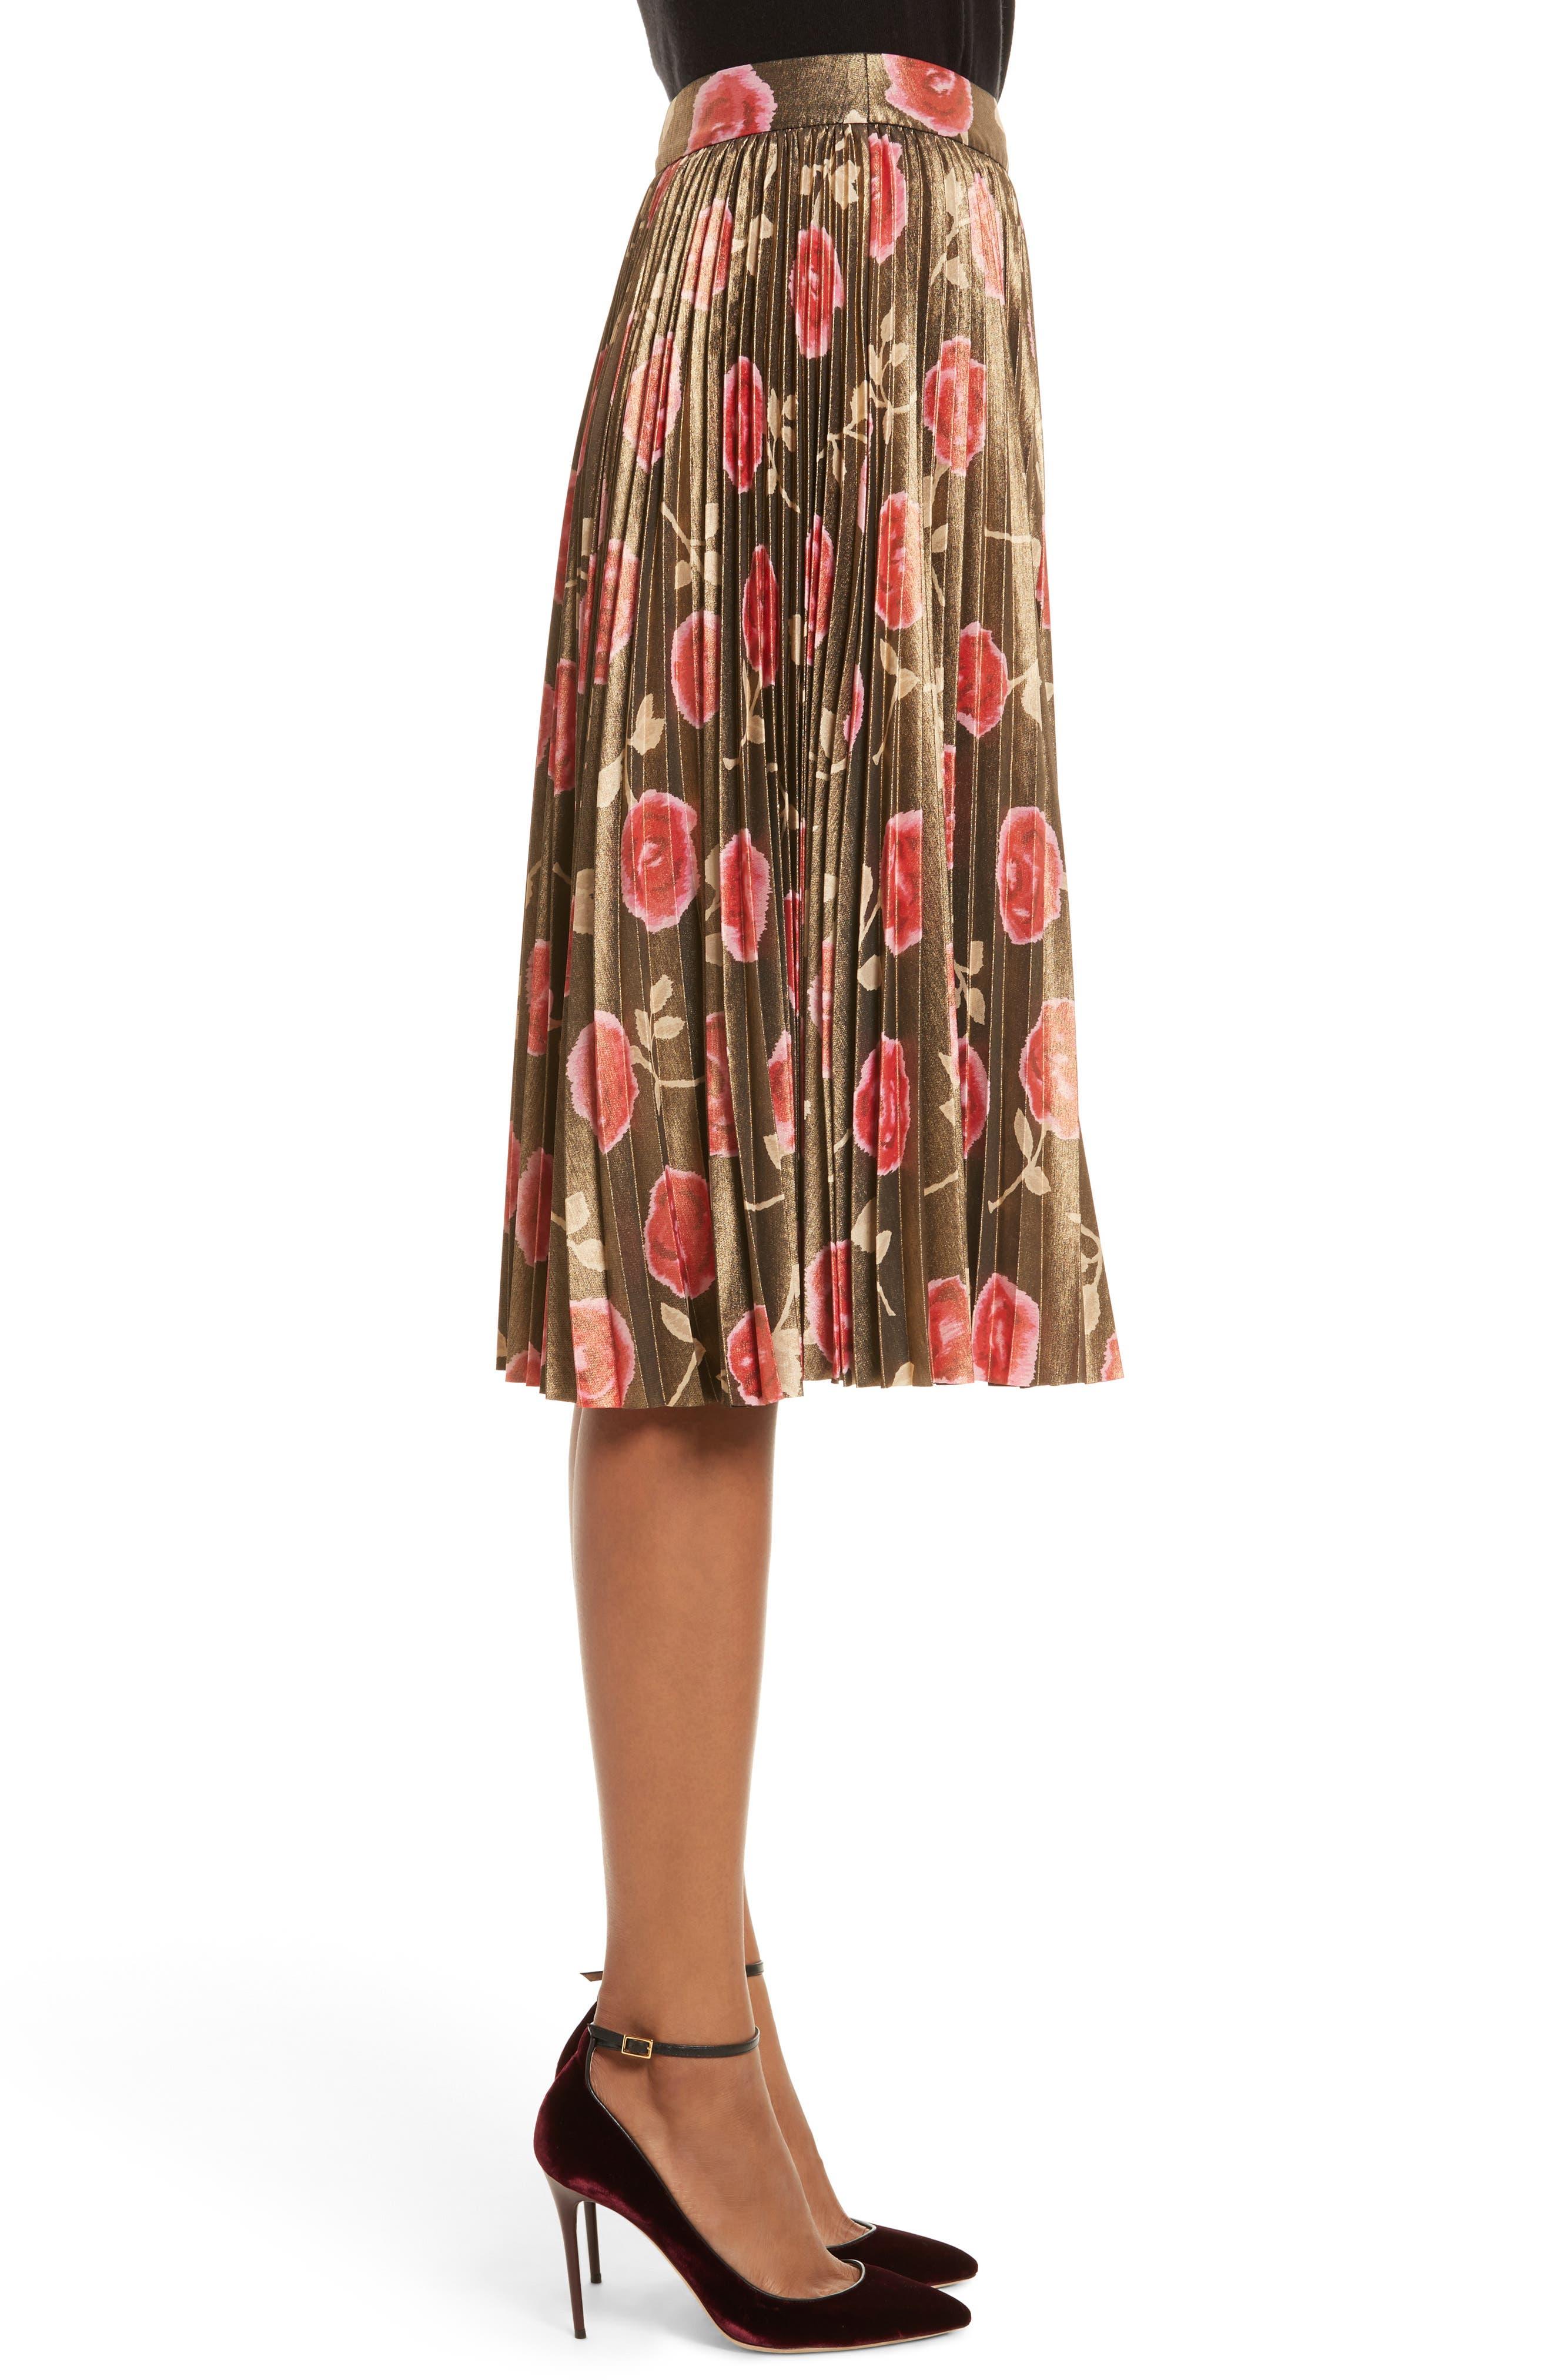 hazy rose pleated metallic skirt,                             Alternate thumbnail 3, color,                             006